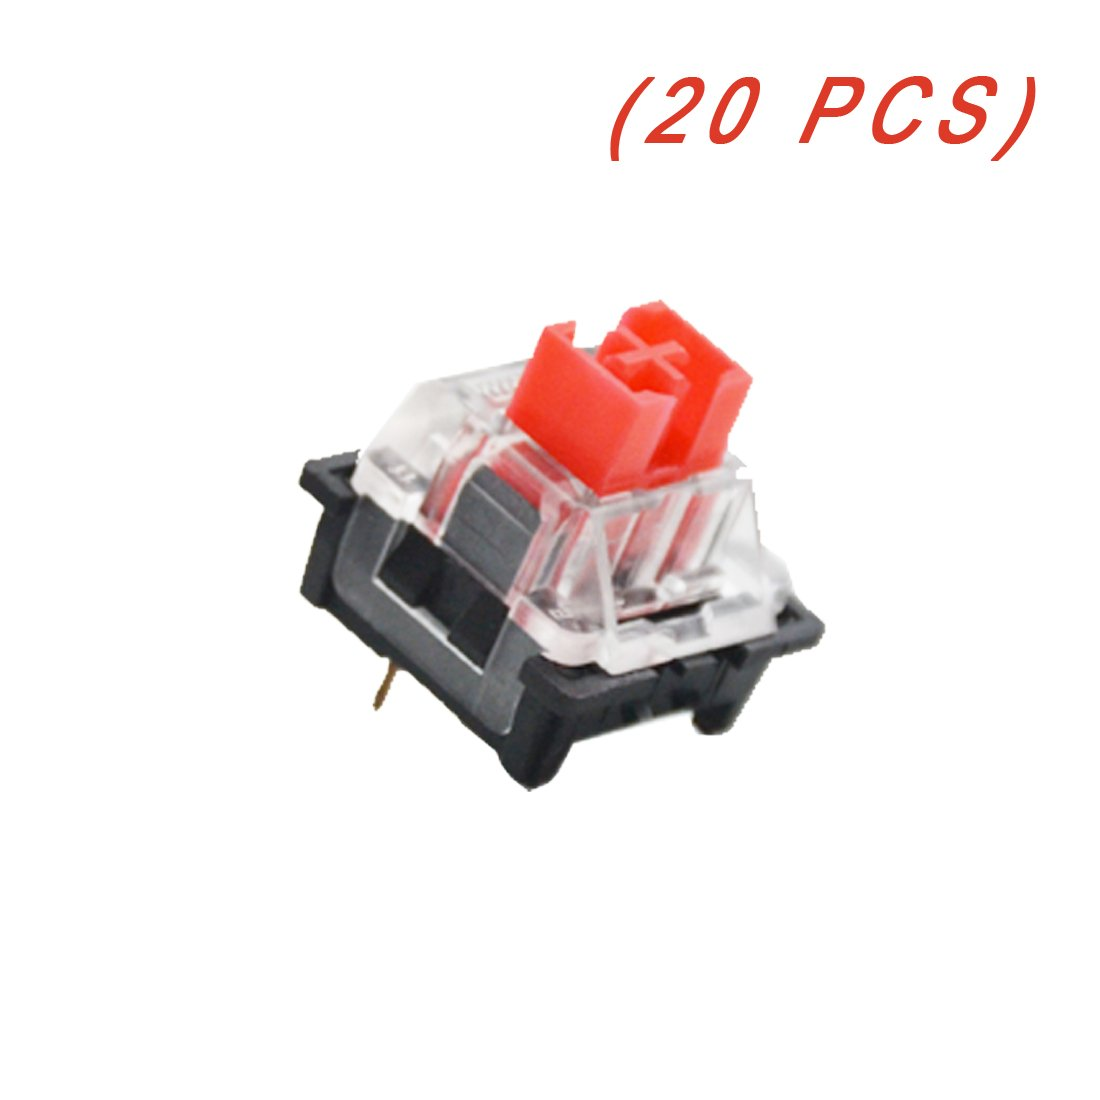 20 Keyswitch - Teclas Outemu Red Para Teclado Mecanico